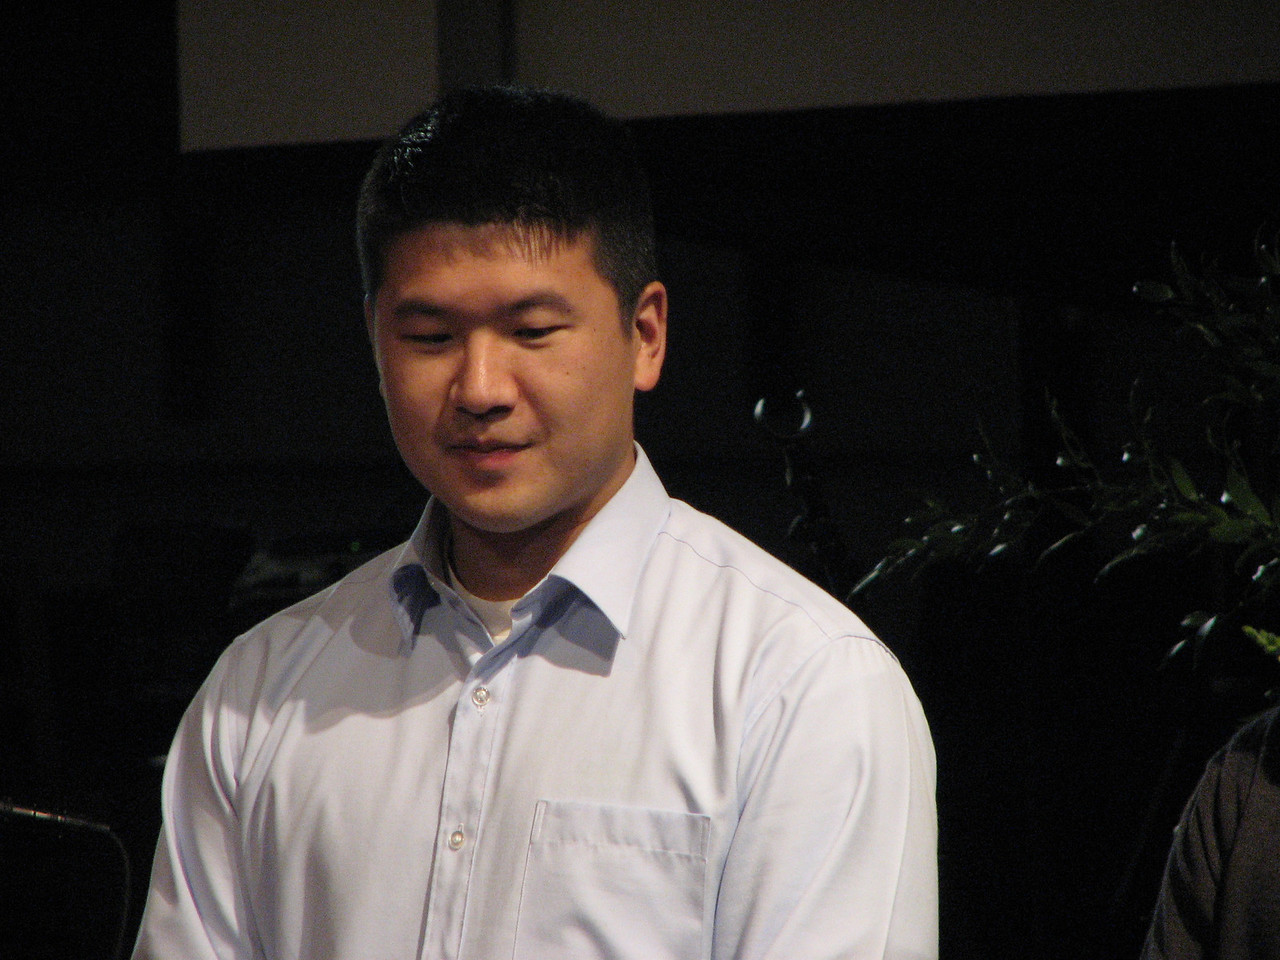 2007 05 18 Fri - Rehearsal - Groomsman Eric Hsieh